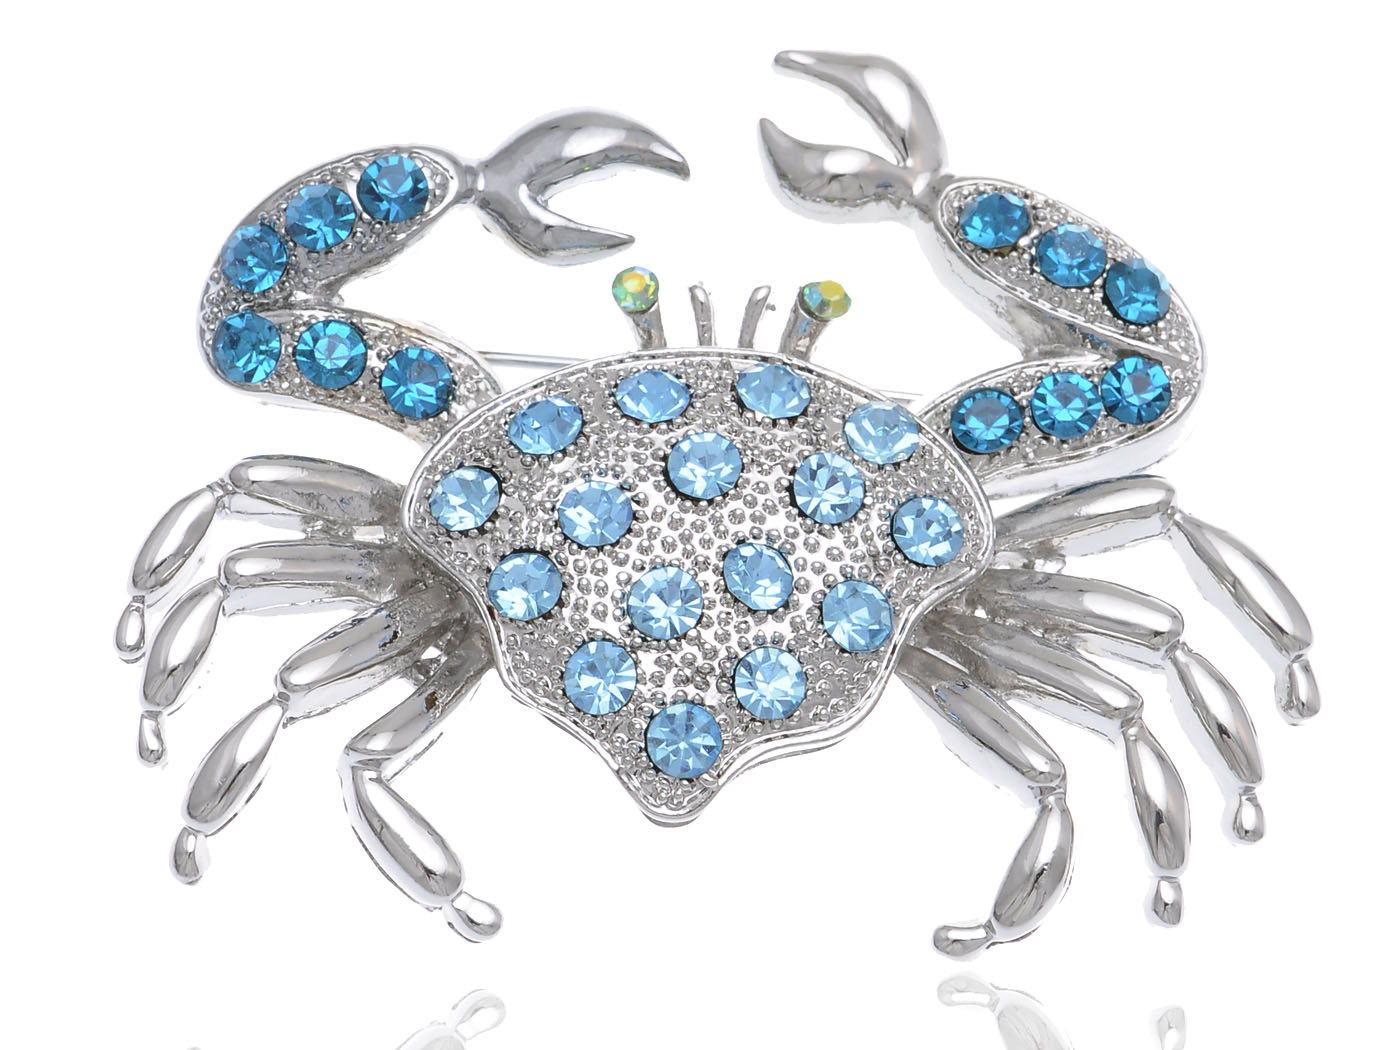 Aqua Light Blue Crystal Rhinestone Crab Critter Collection Fashion Brooch Pin by